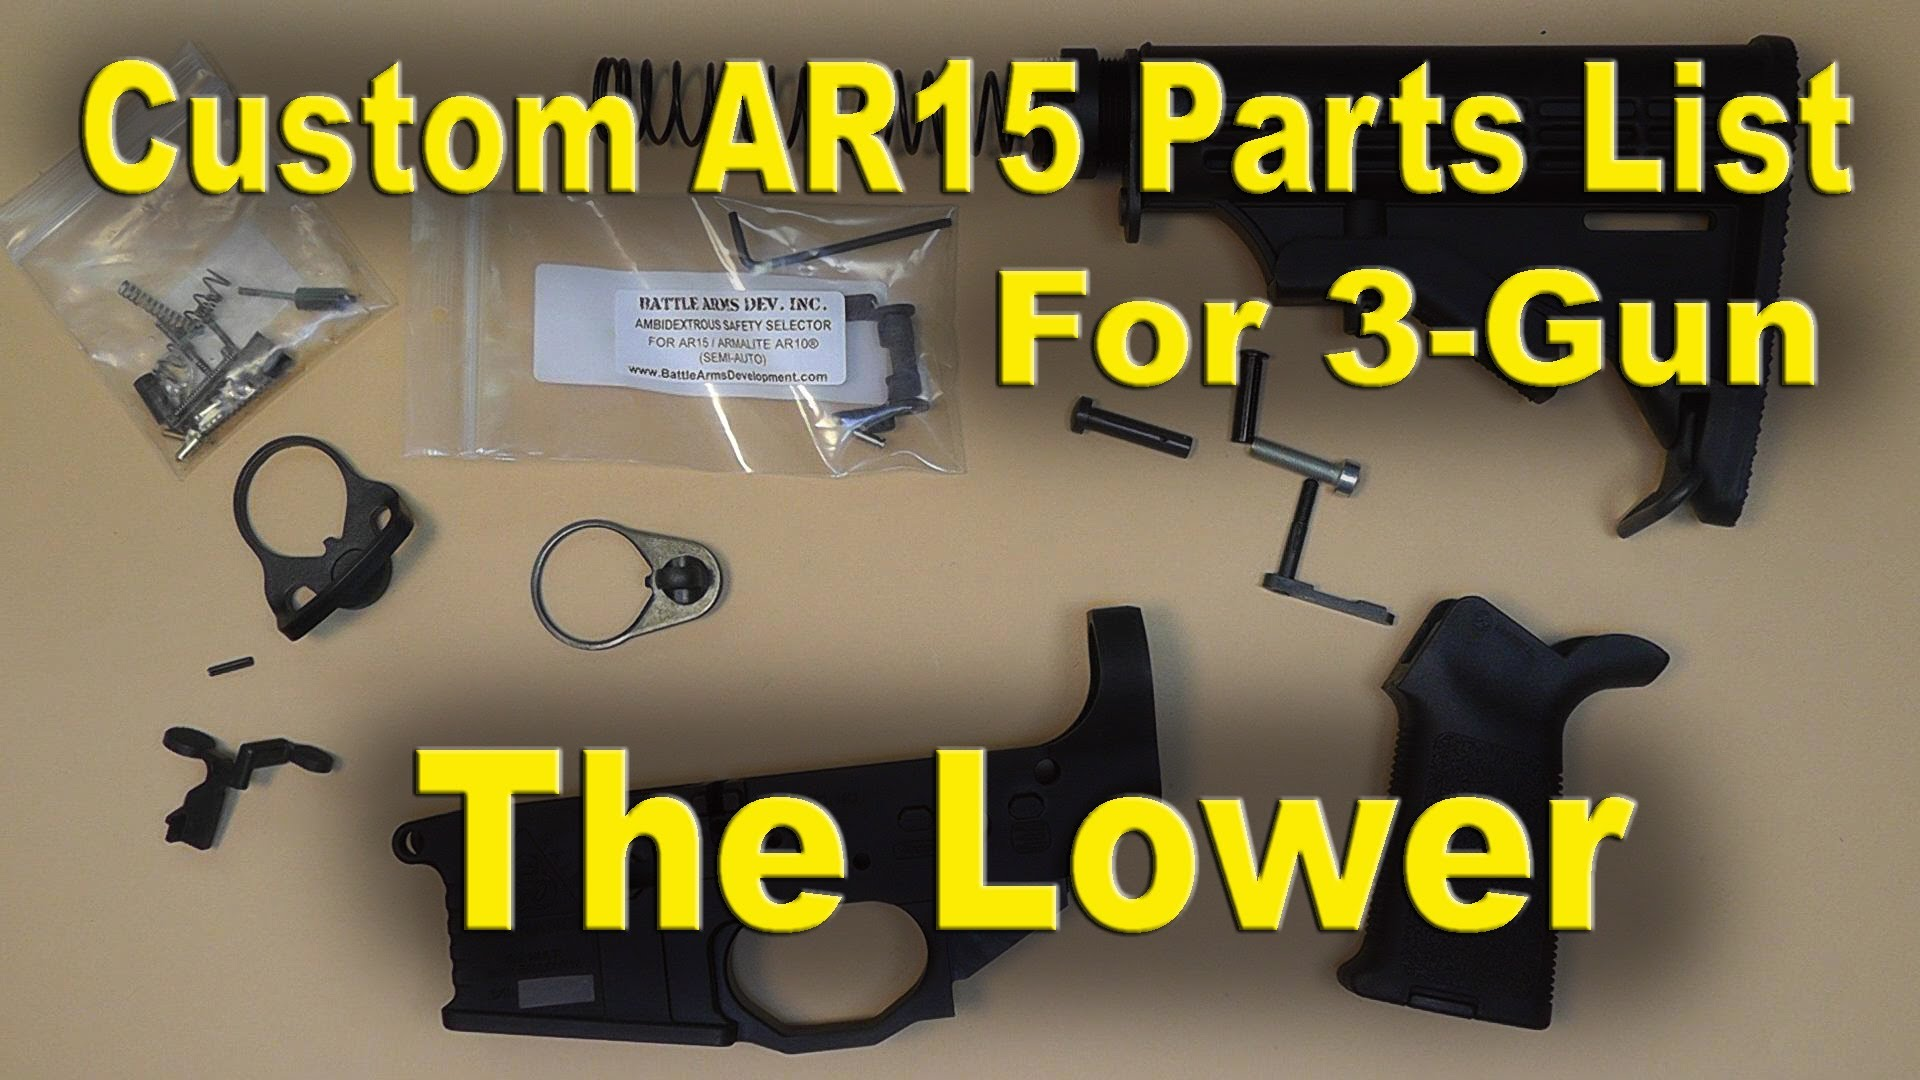 AR-15 Lower Parts List for a Custom 3-Gun Rifle